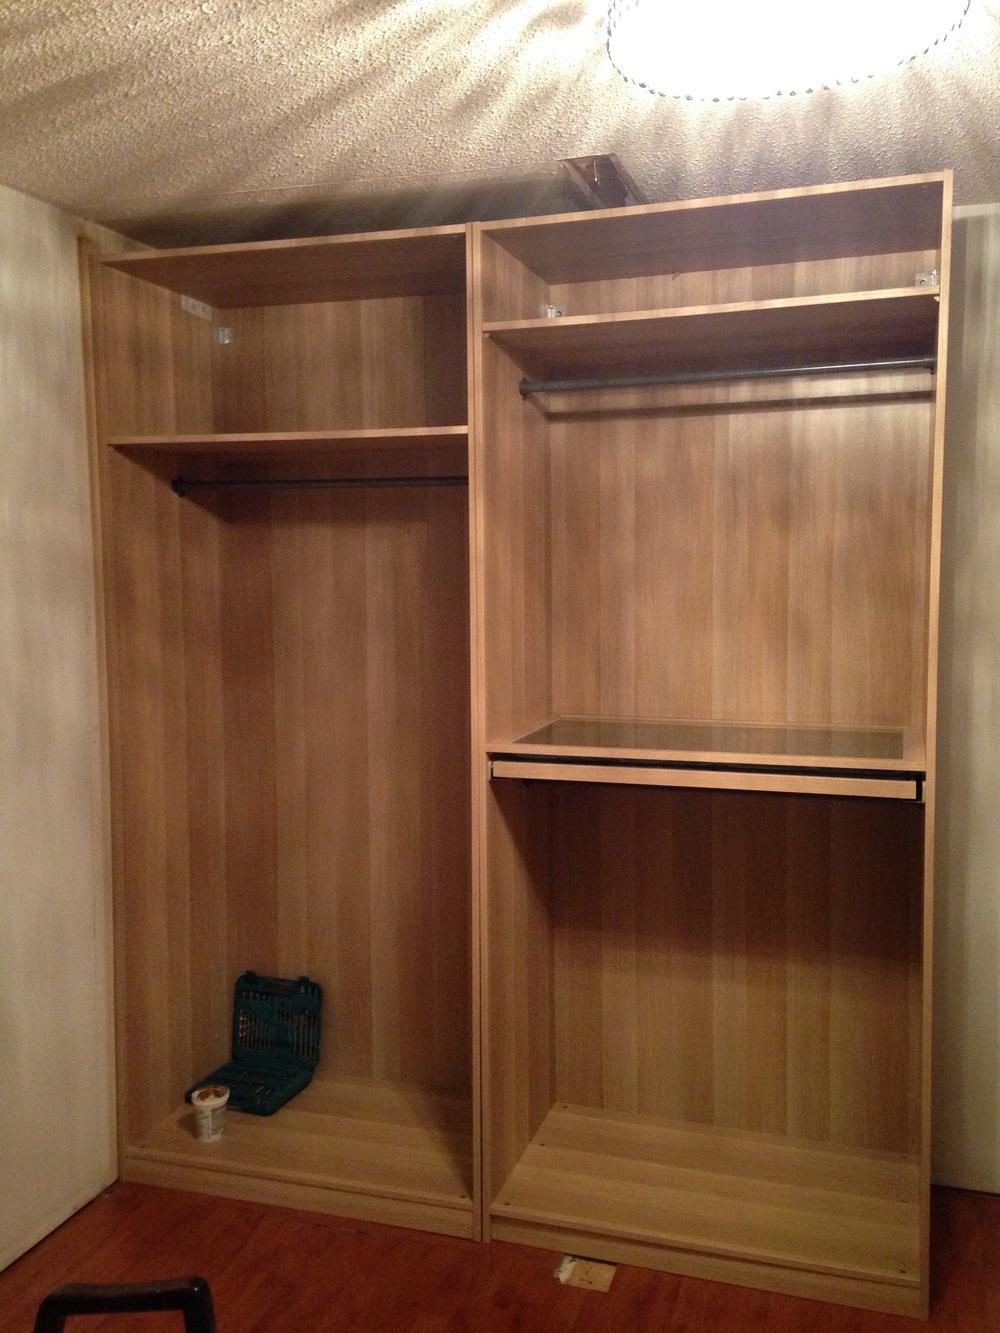 Interior Design Calgary, Home Decor & House Plans | IKEA Closet Bedroom No Doors | Dutch Touch Interiors